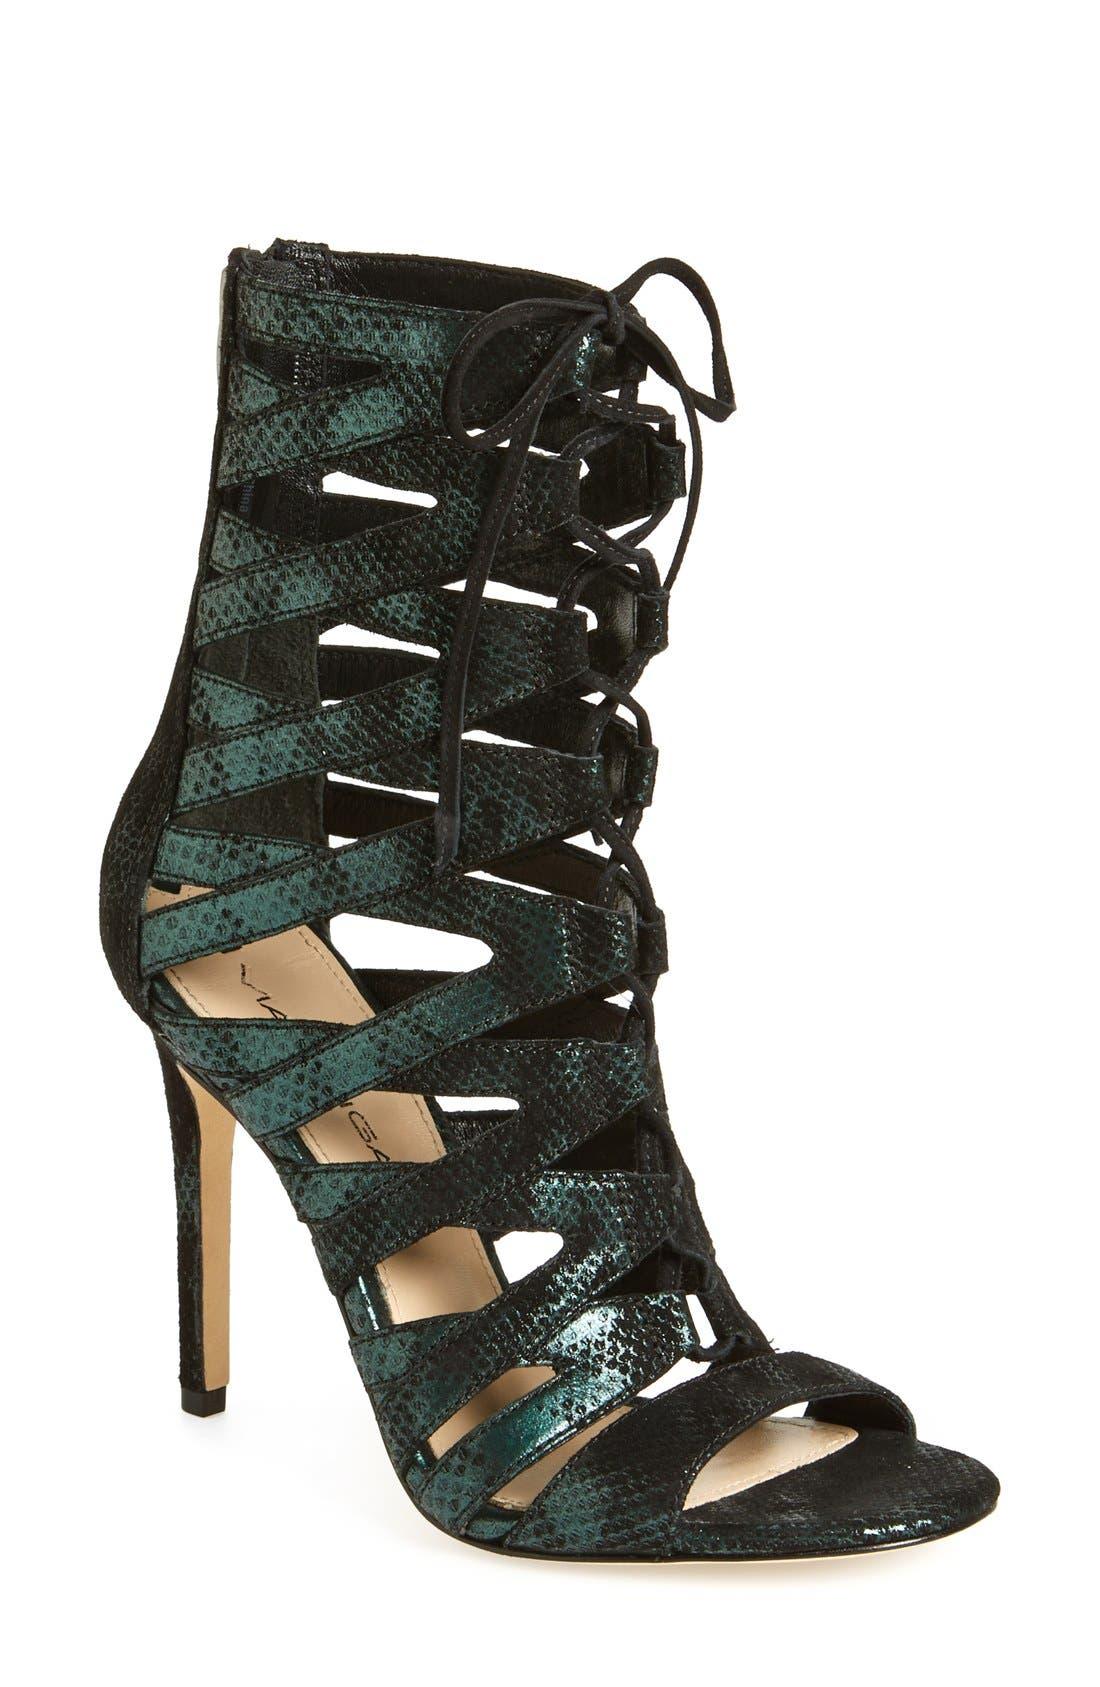 Main Image - Via Spiga 'Teaira' Sandal (Women)